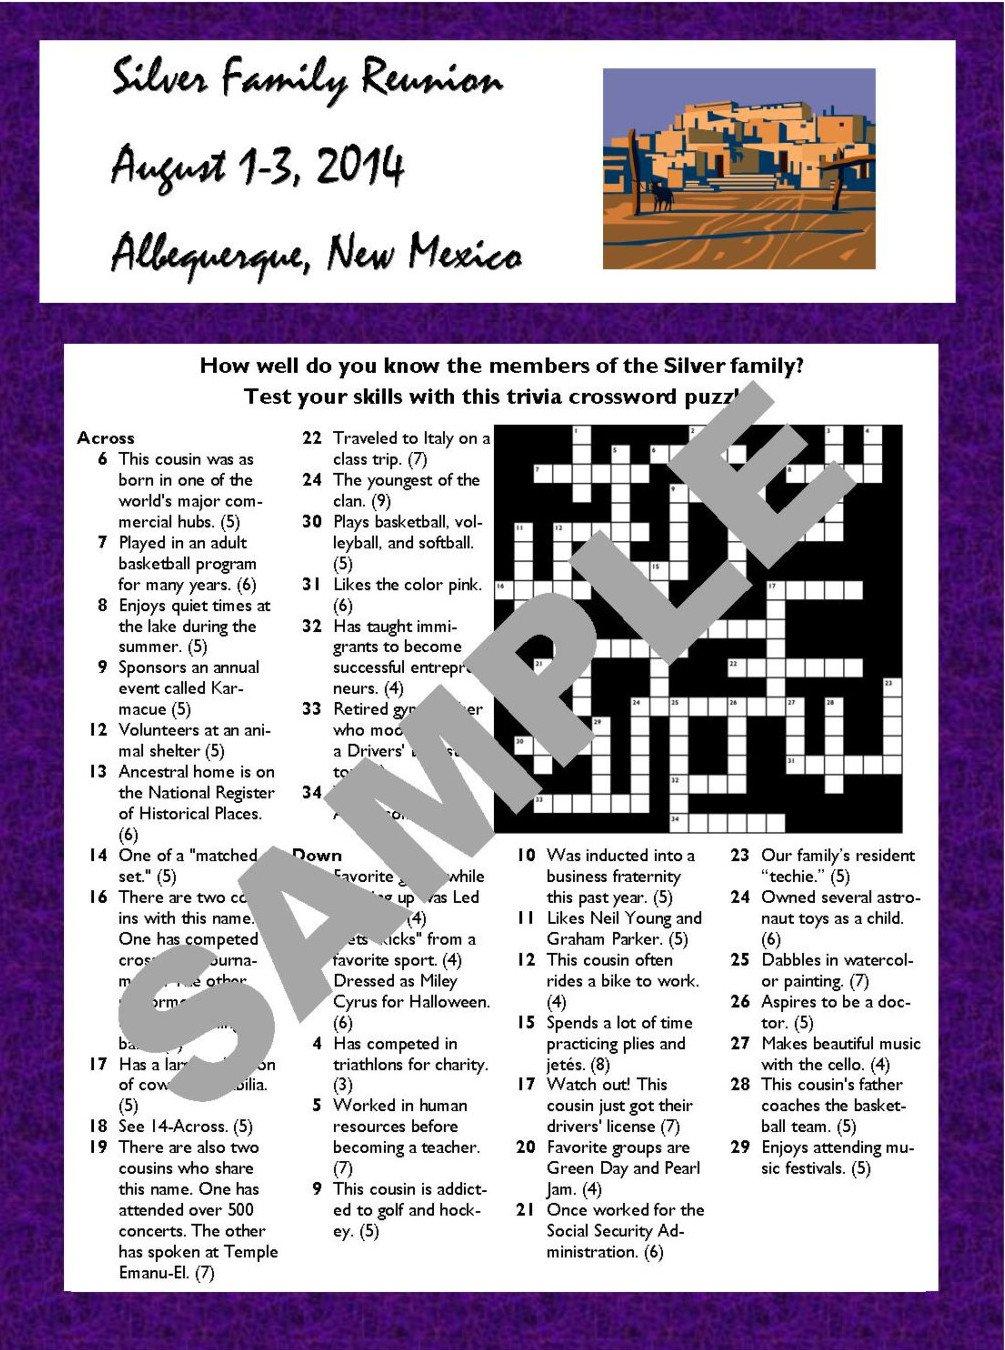 Personalized Family Reunion Printable Trivia Crossword, printable family reunion games